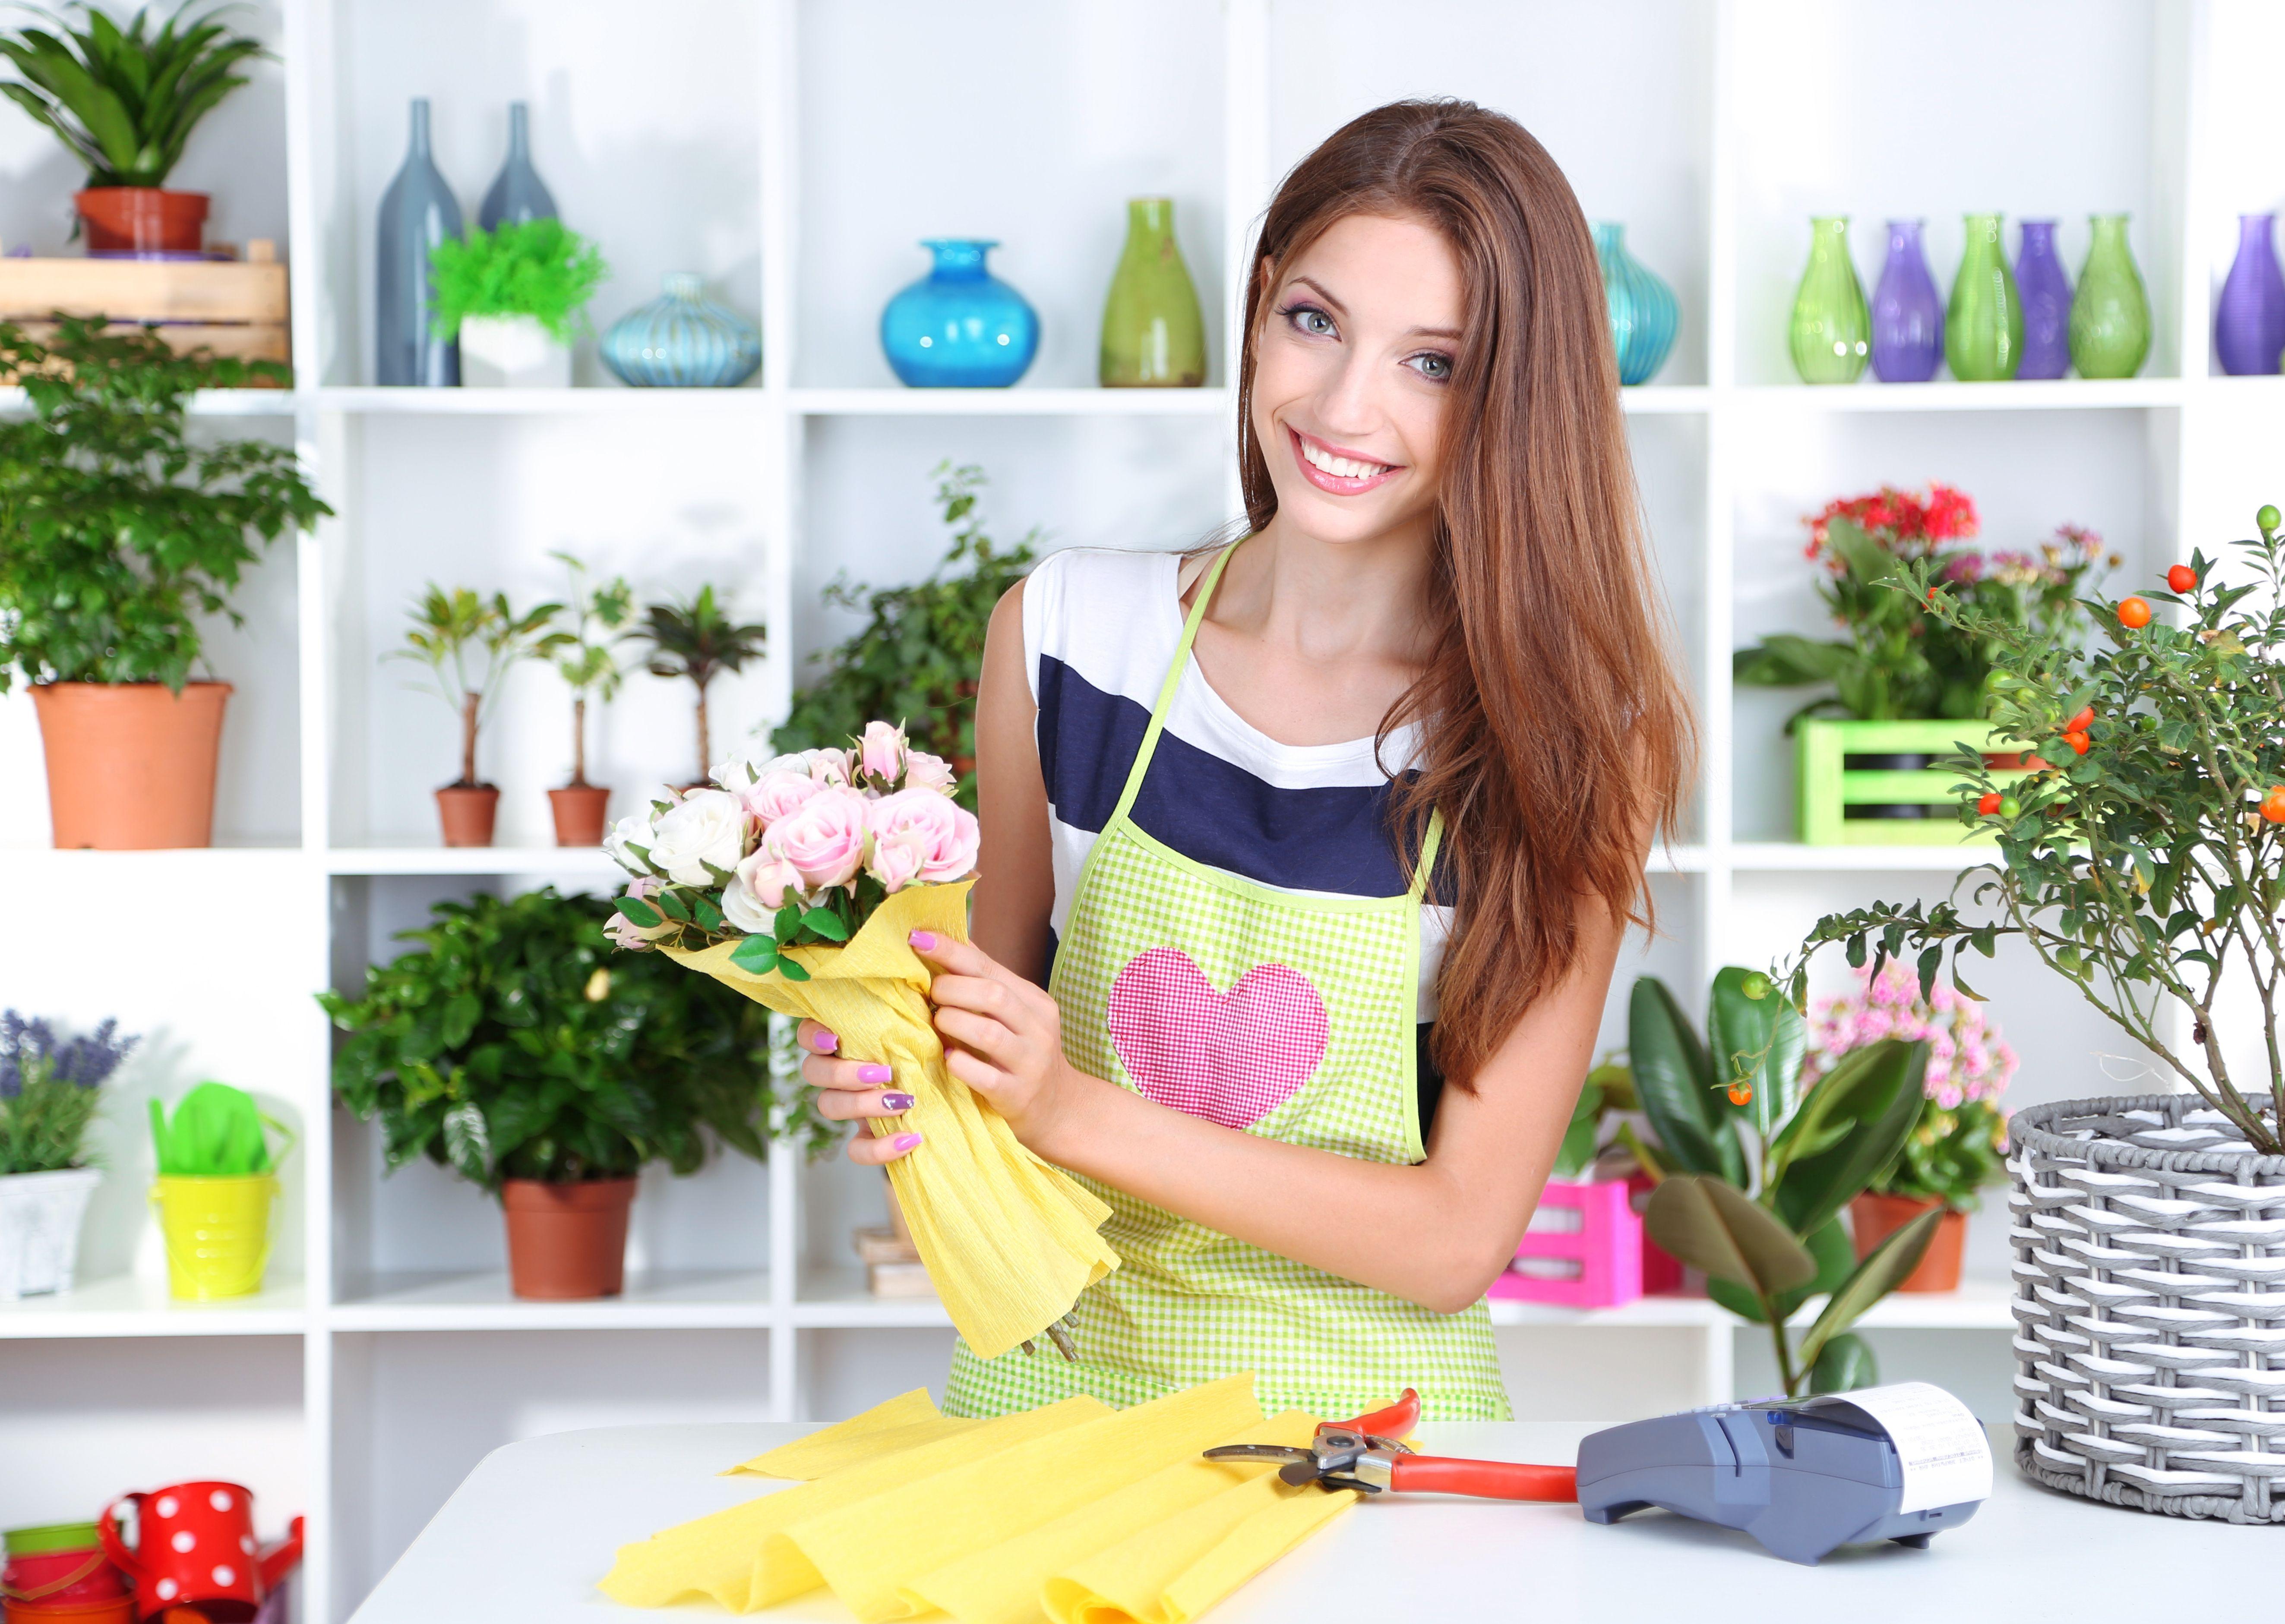 50 Creative Florist And Flower Shop Names Flower Shop Names Flower Shop Flower Business